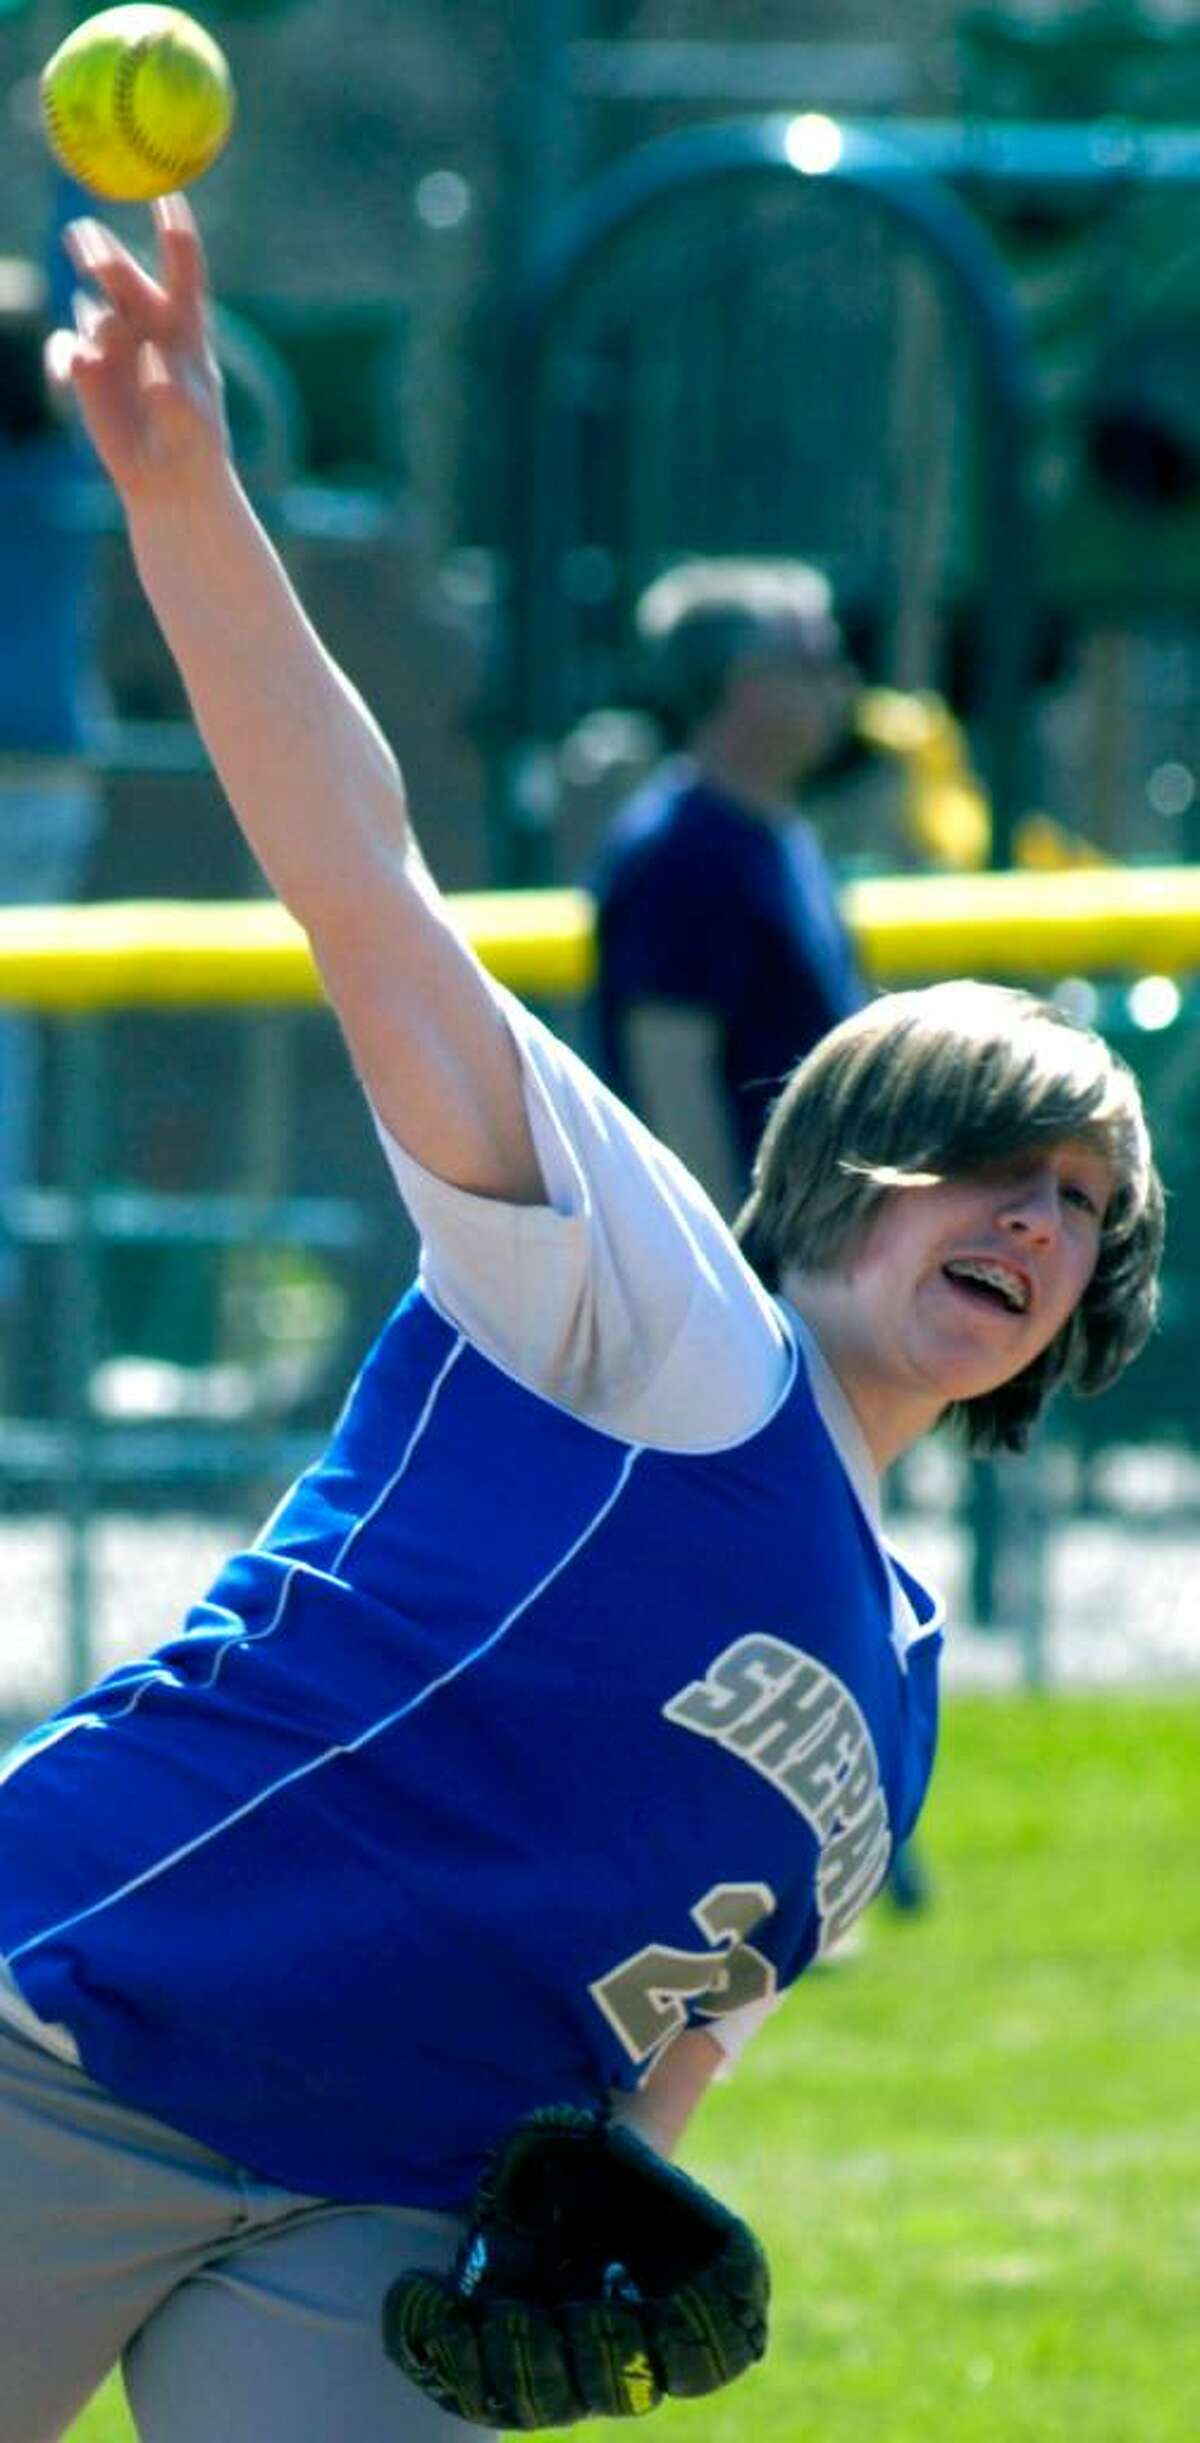 SPECTRUM/Shepaug Valley High School softball shortstop Nikki Hartman makes a throw during April 3, 2010 scrimmage vs. Weston at Ayer Field.